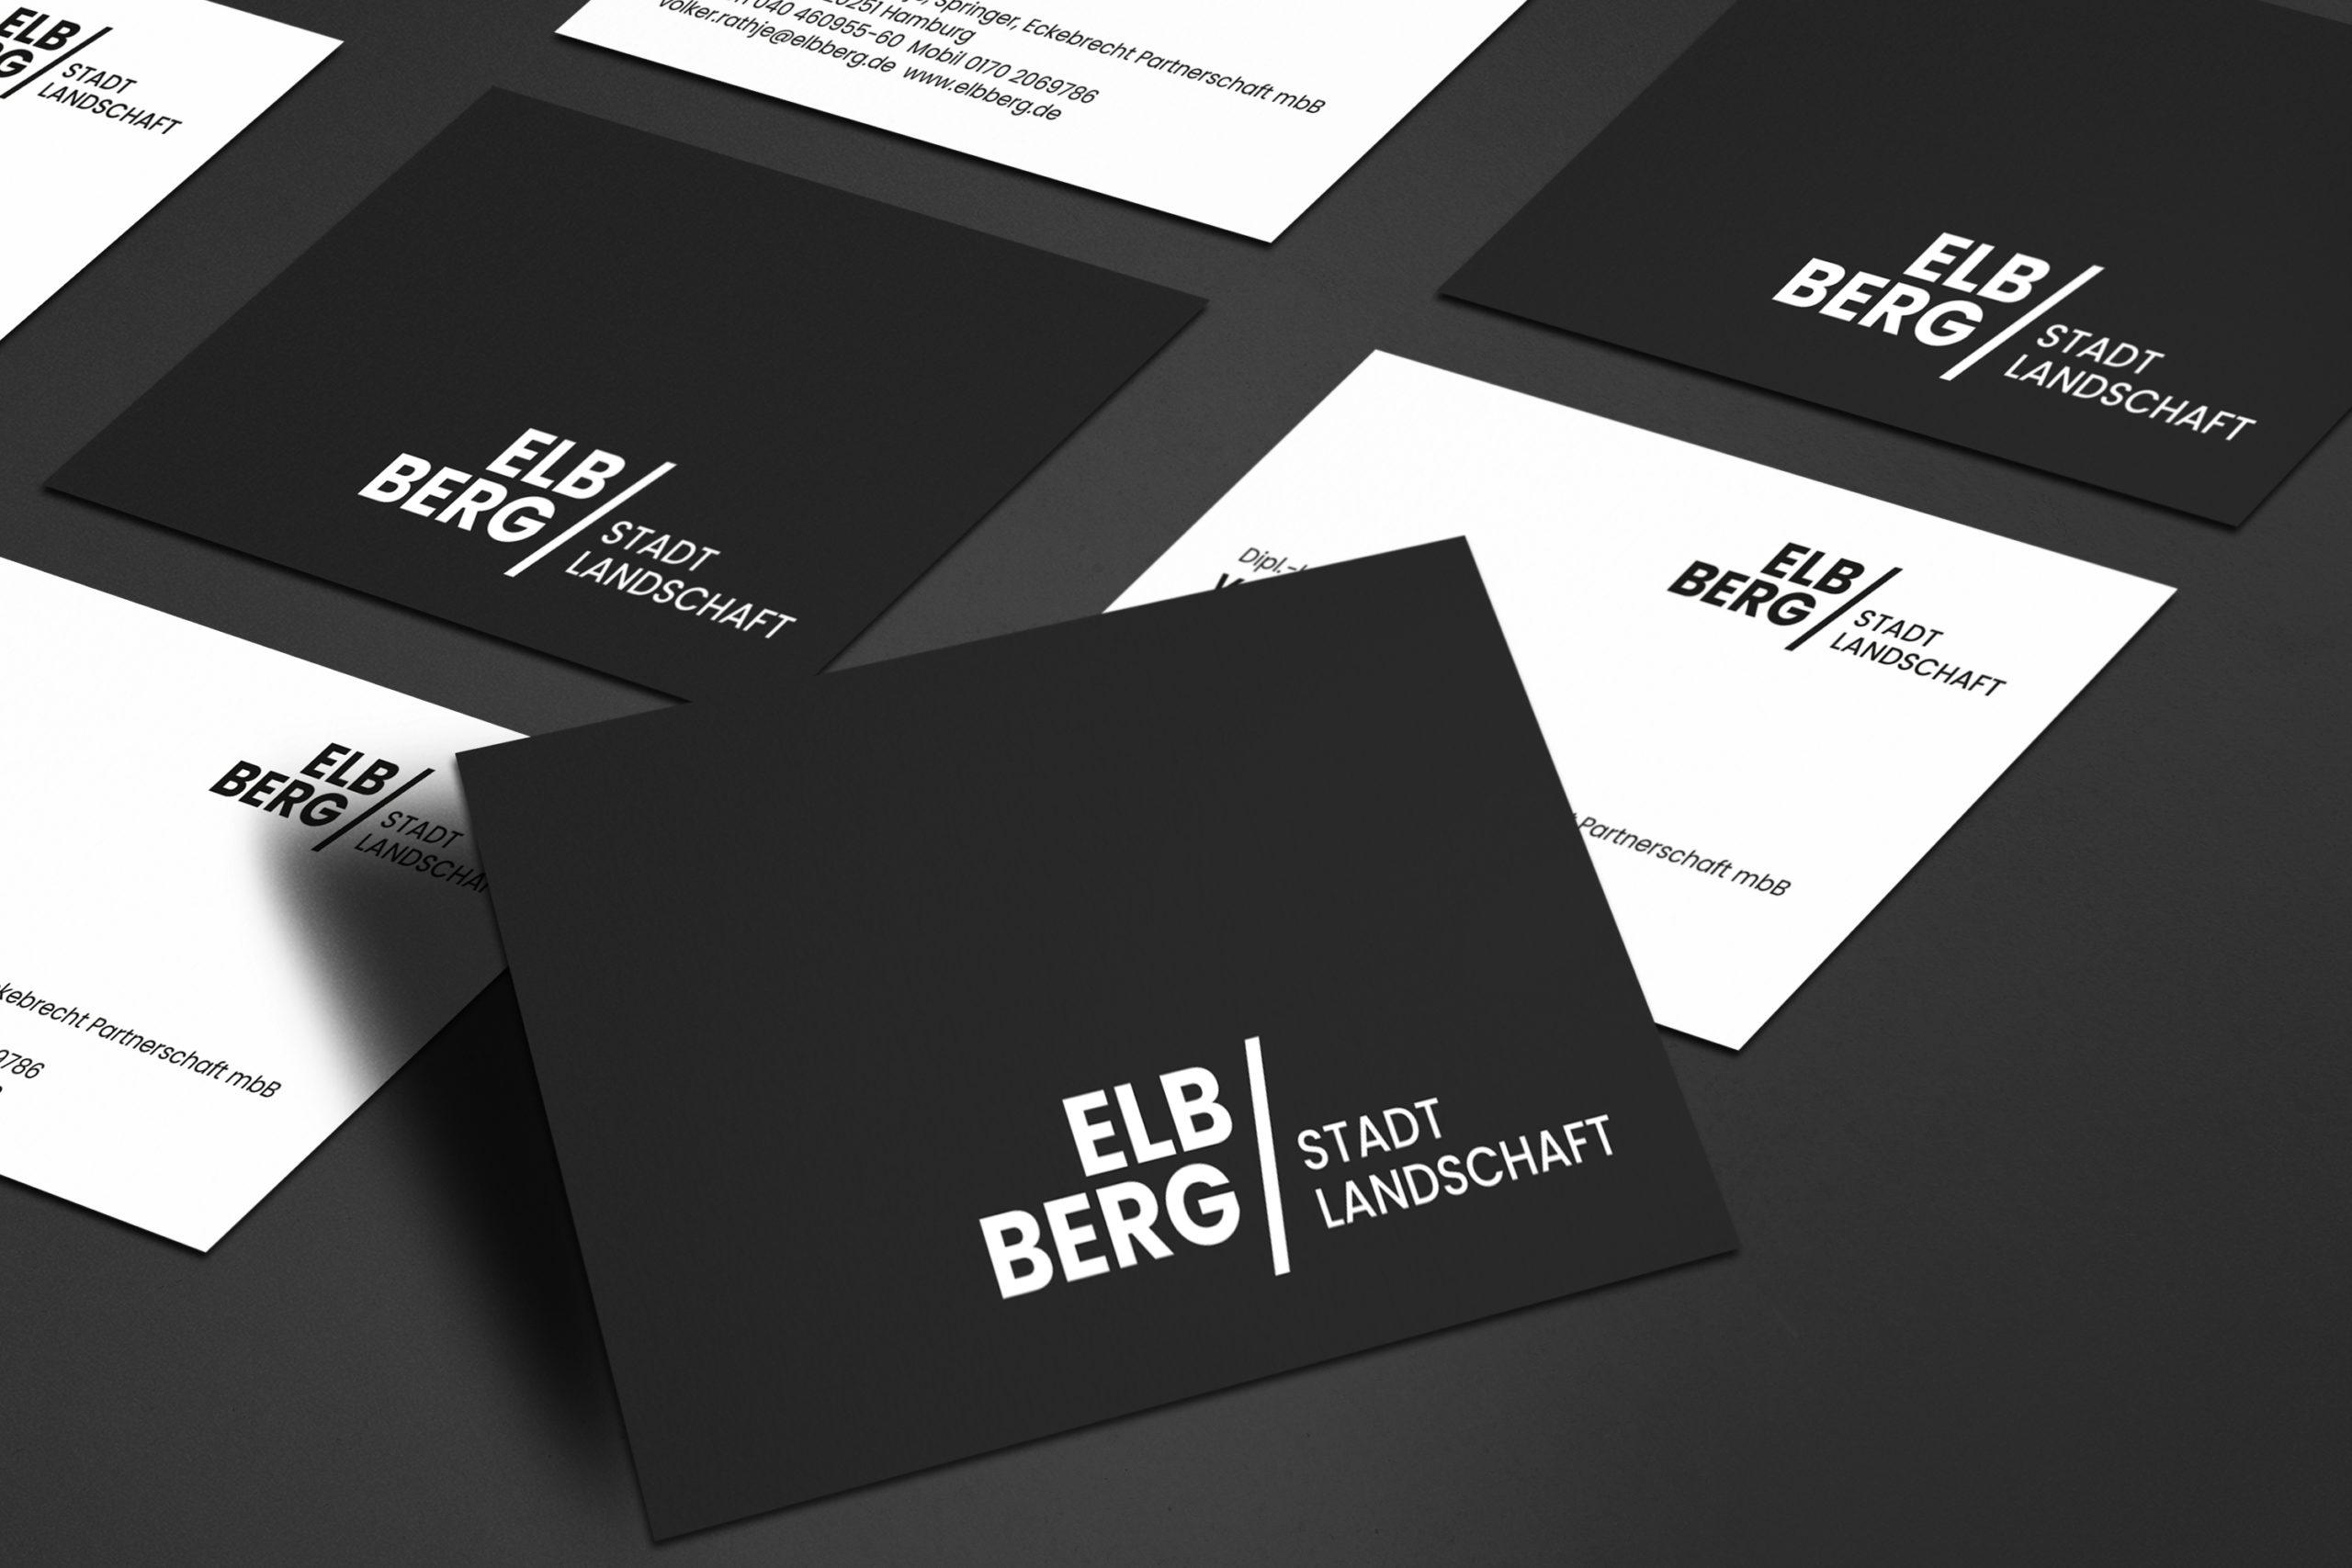 ELBBERG Stadtlandschaft l Stadt- und Landschaftsplanung l CI/Logo Design